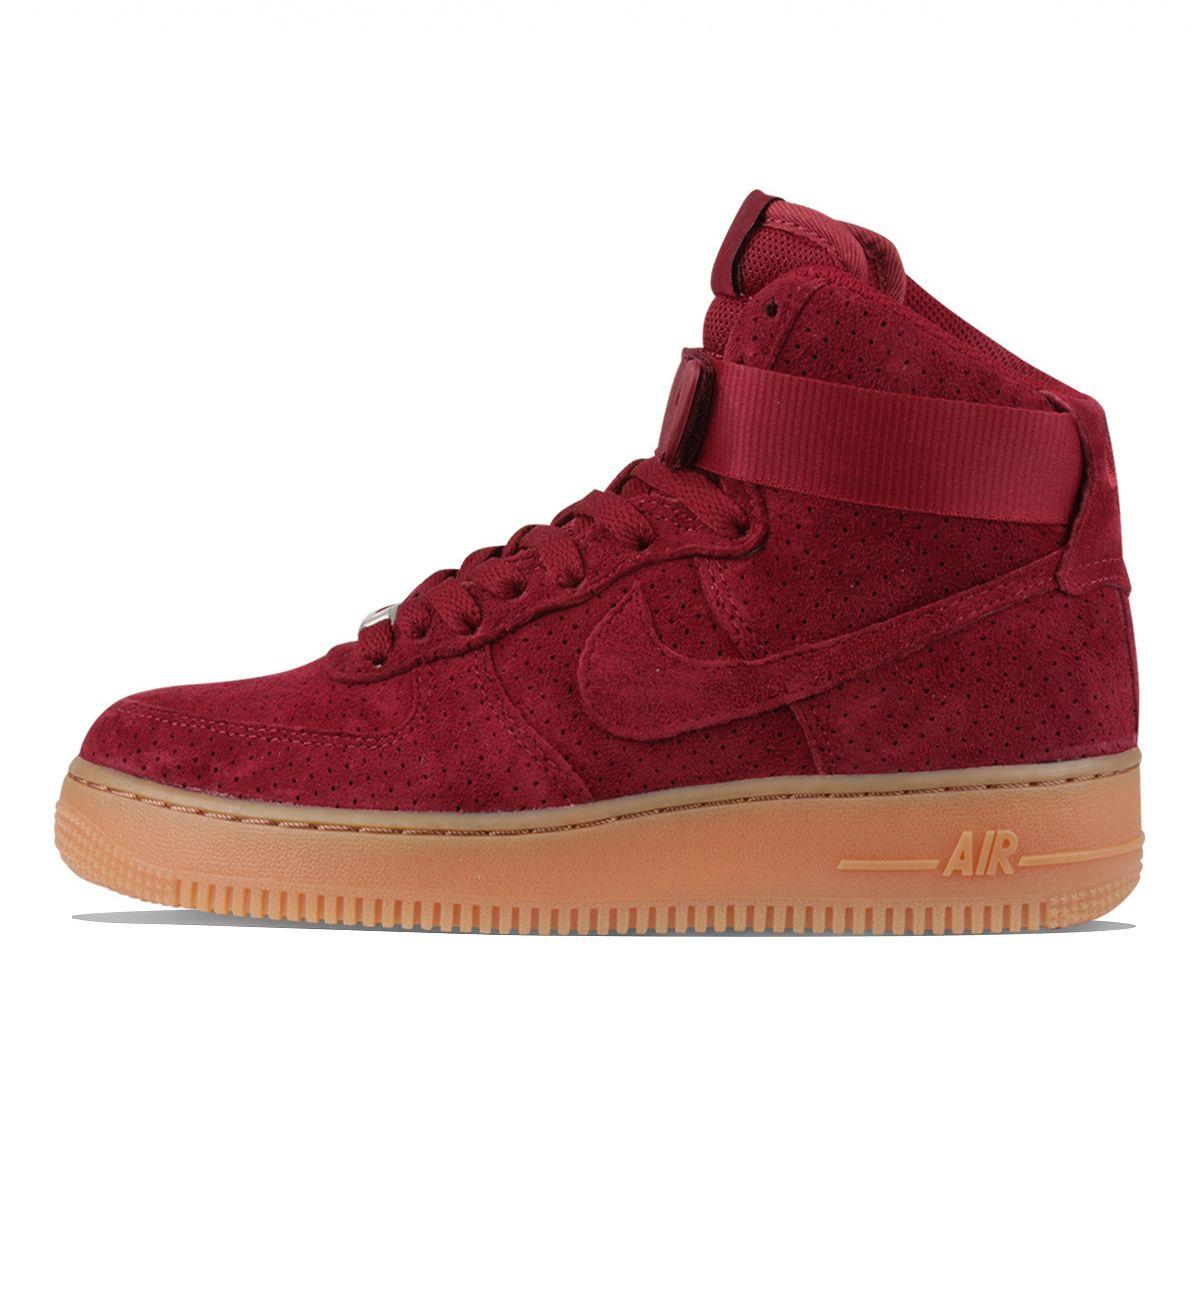 cheap for discount 7b513 e02eb Nike WMNS Air Force 1 Hi Suede Team Red  Team Red - Nike This Womens Nike  Air Force 1 High Suede in team red has all suede uppers, a gum midsole ...